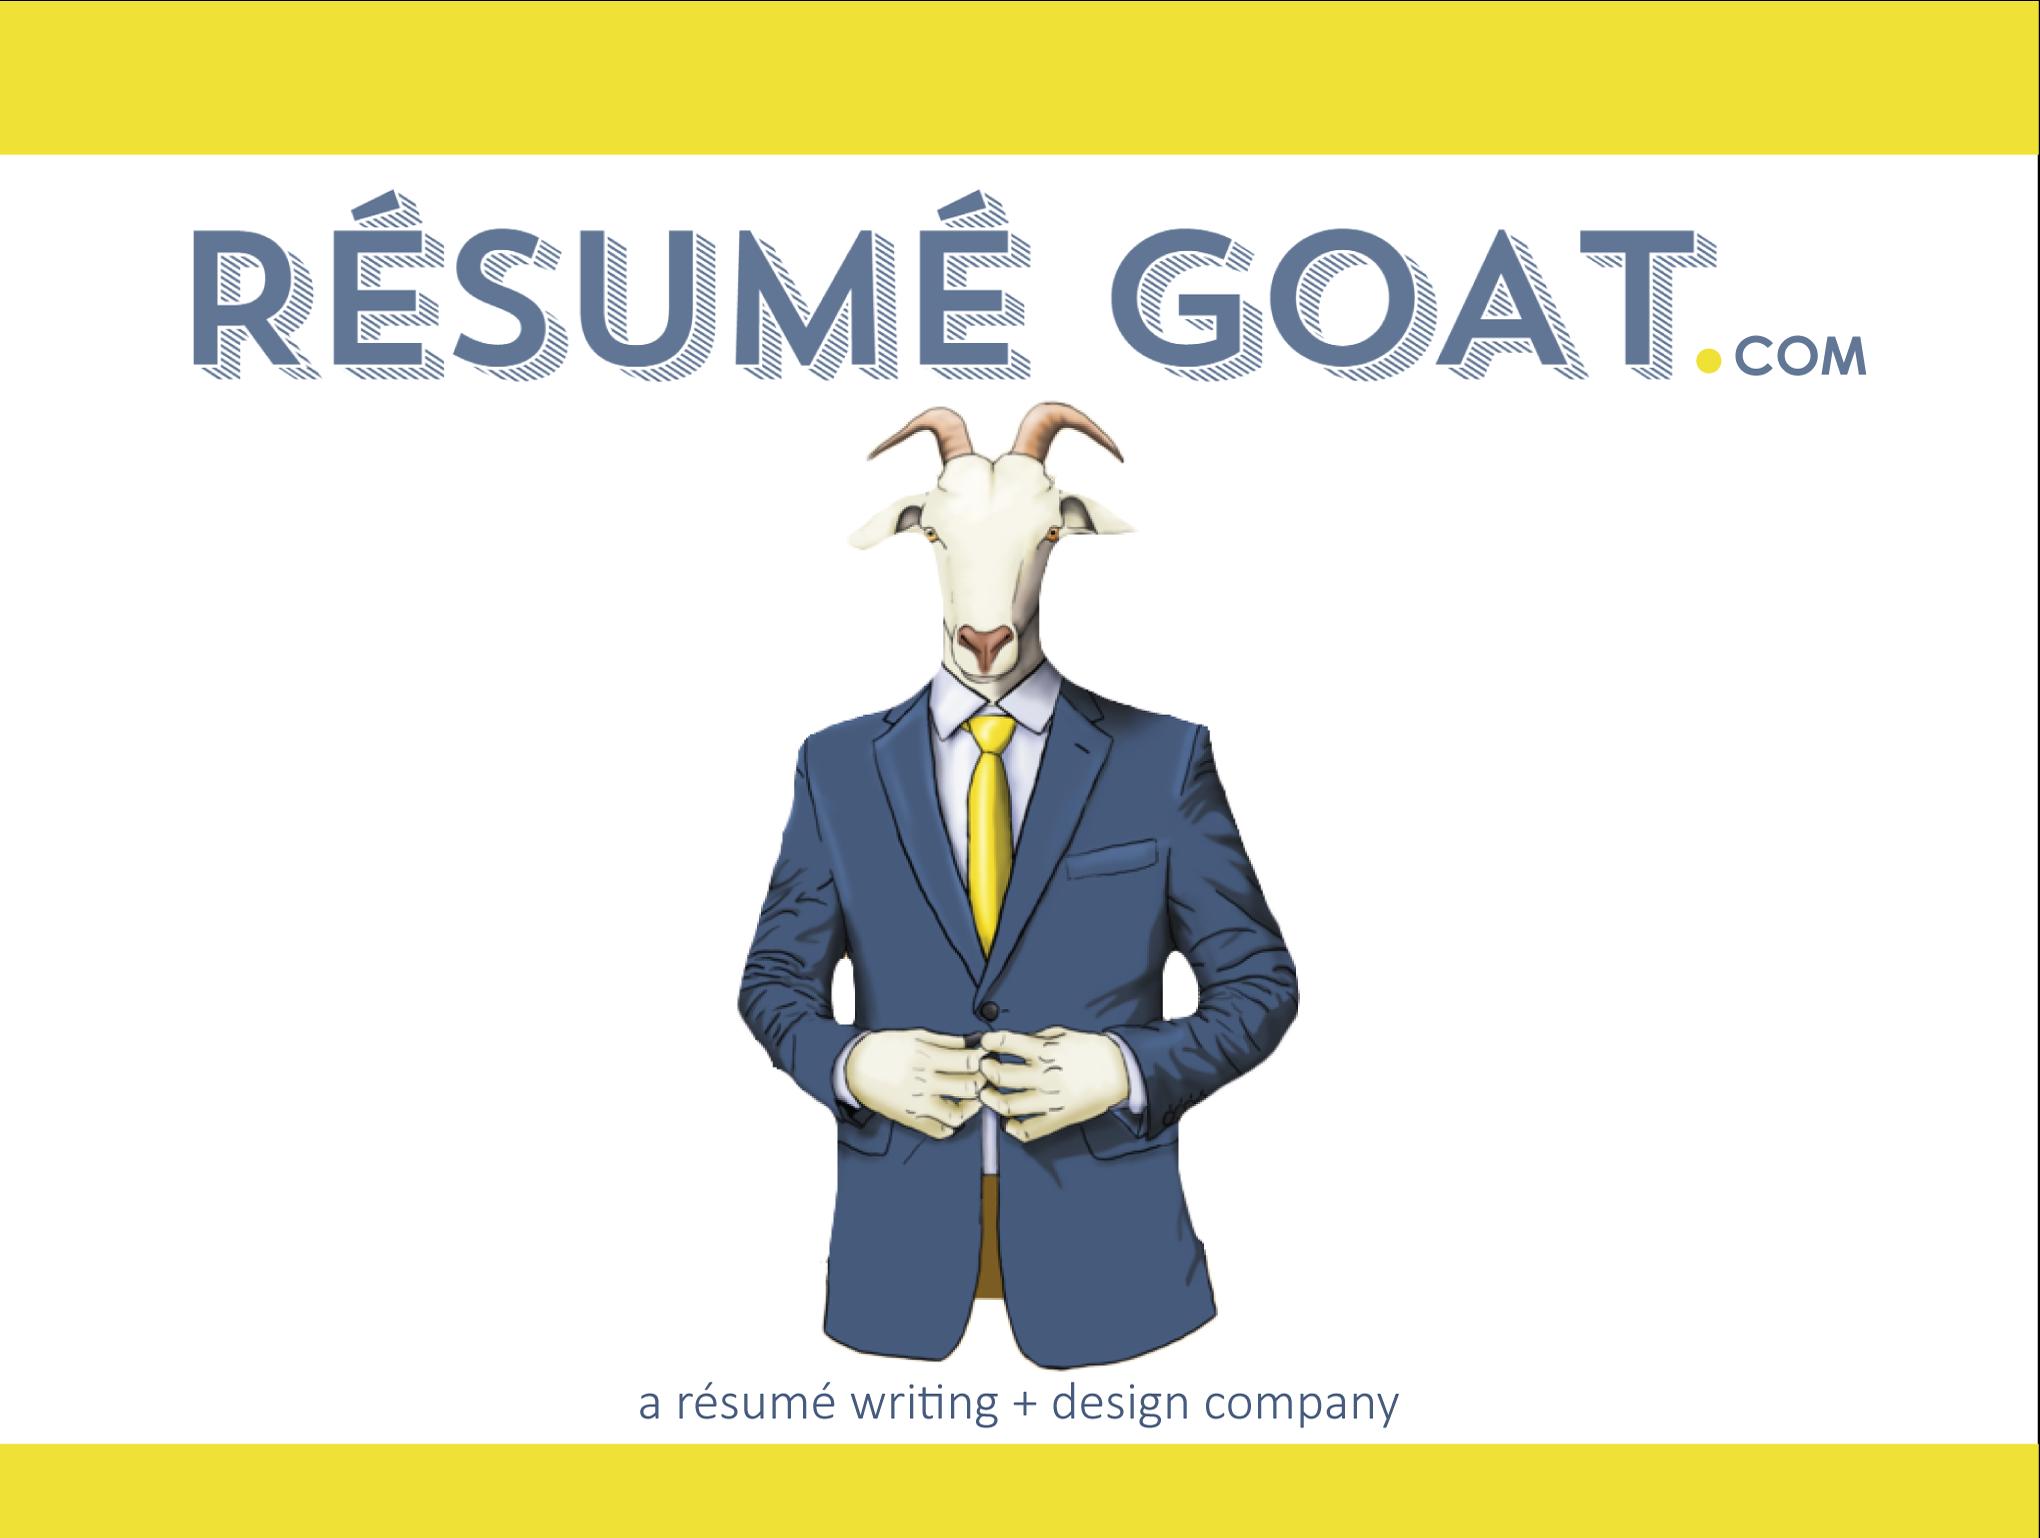 Résumé Goat | Austin, TX | Résumé Writing